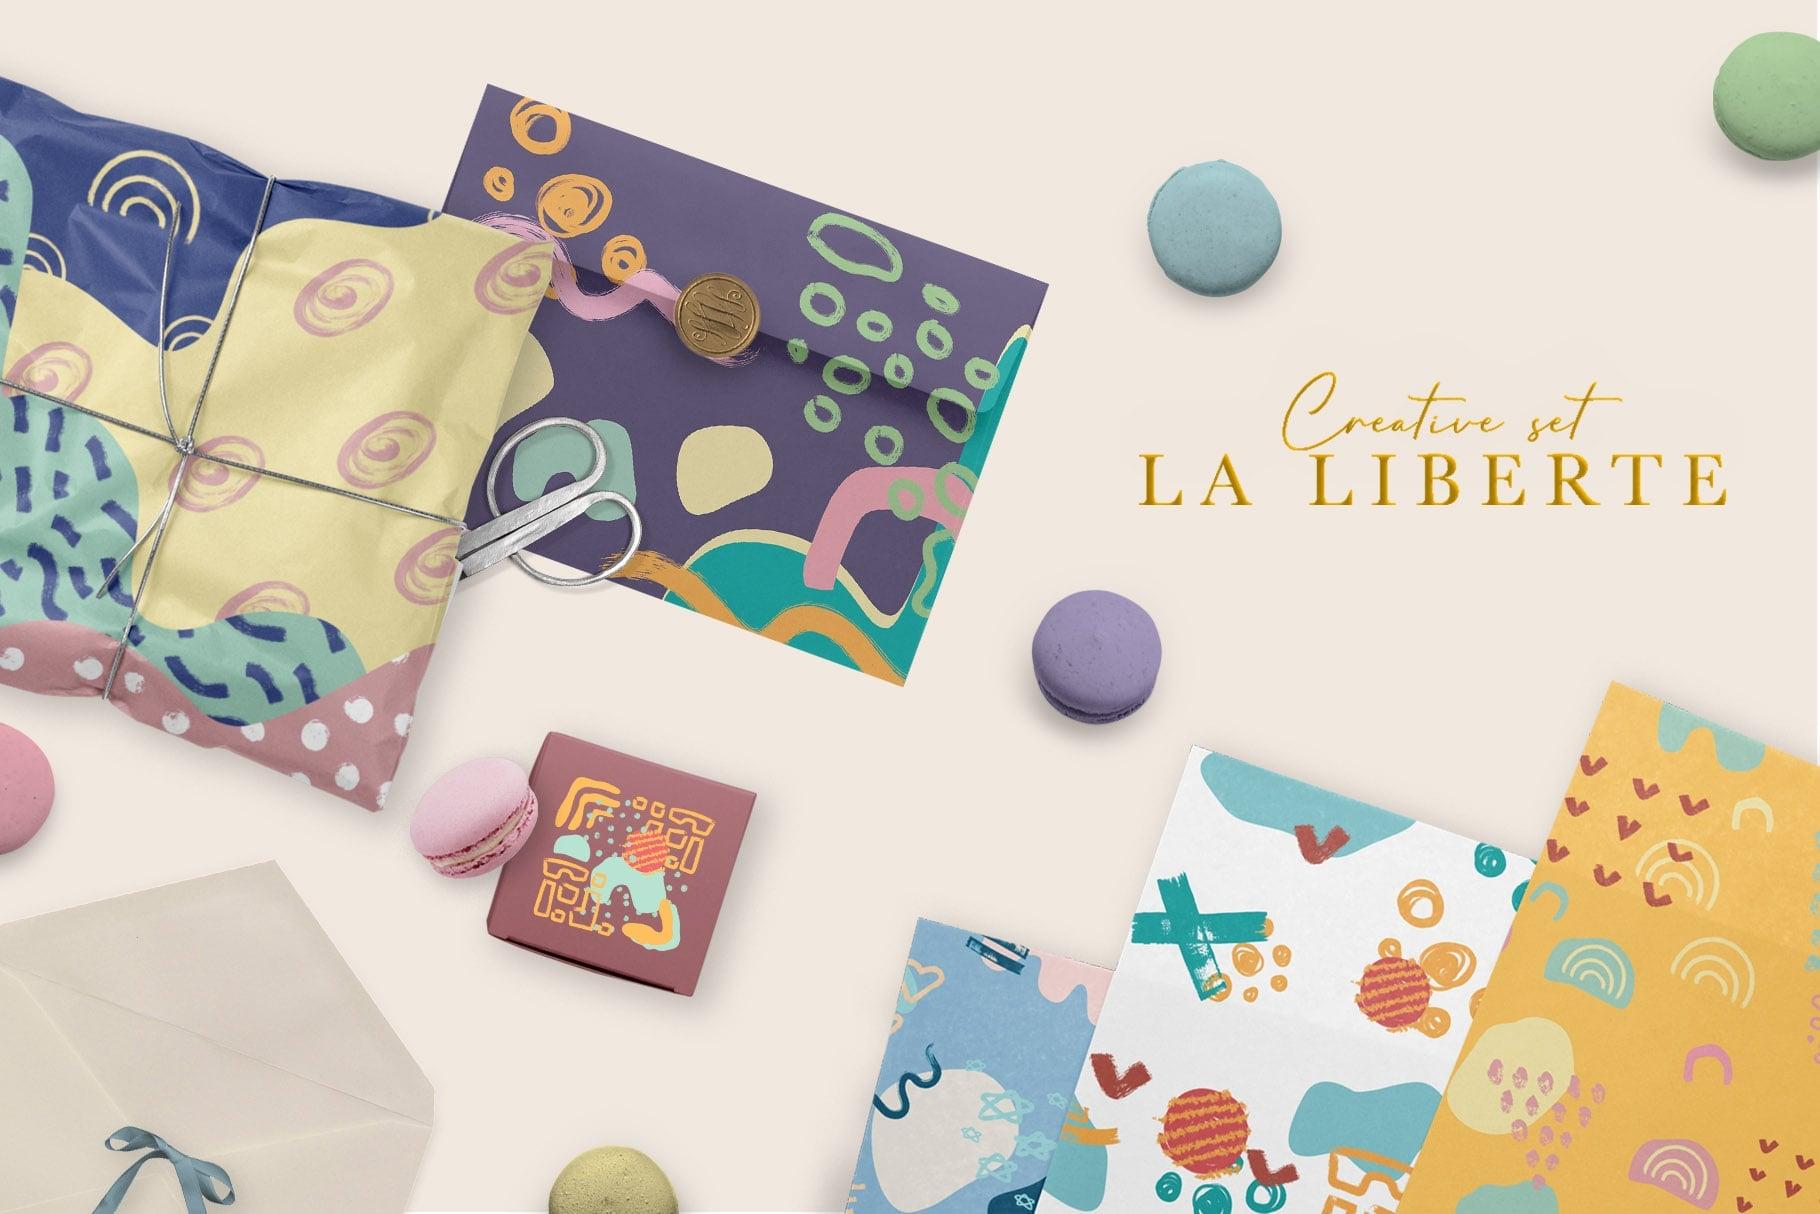 La Liberte Creative Set (Abstract Shapes and Elements) - $15 - Prev8 min